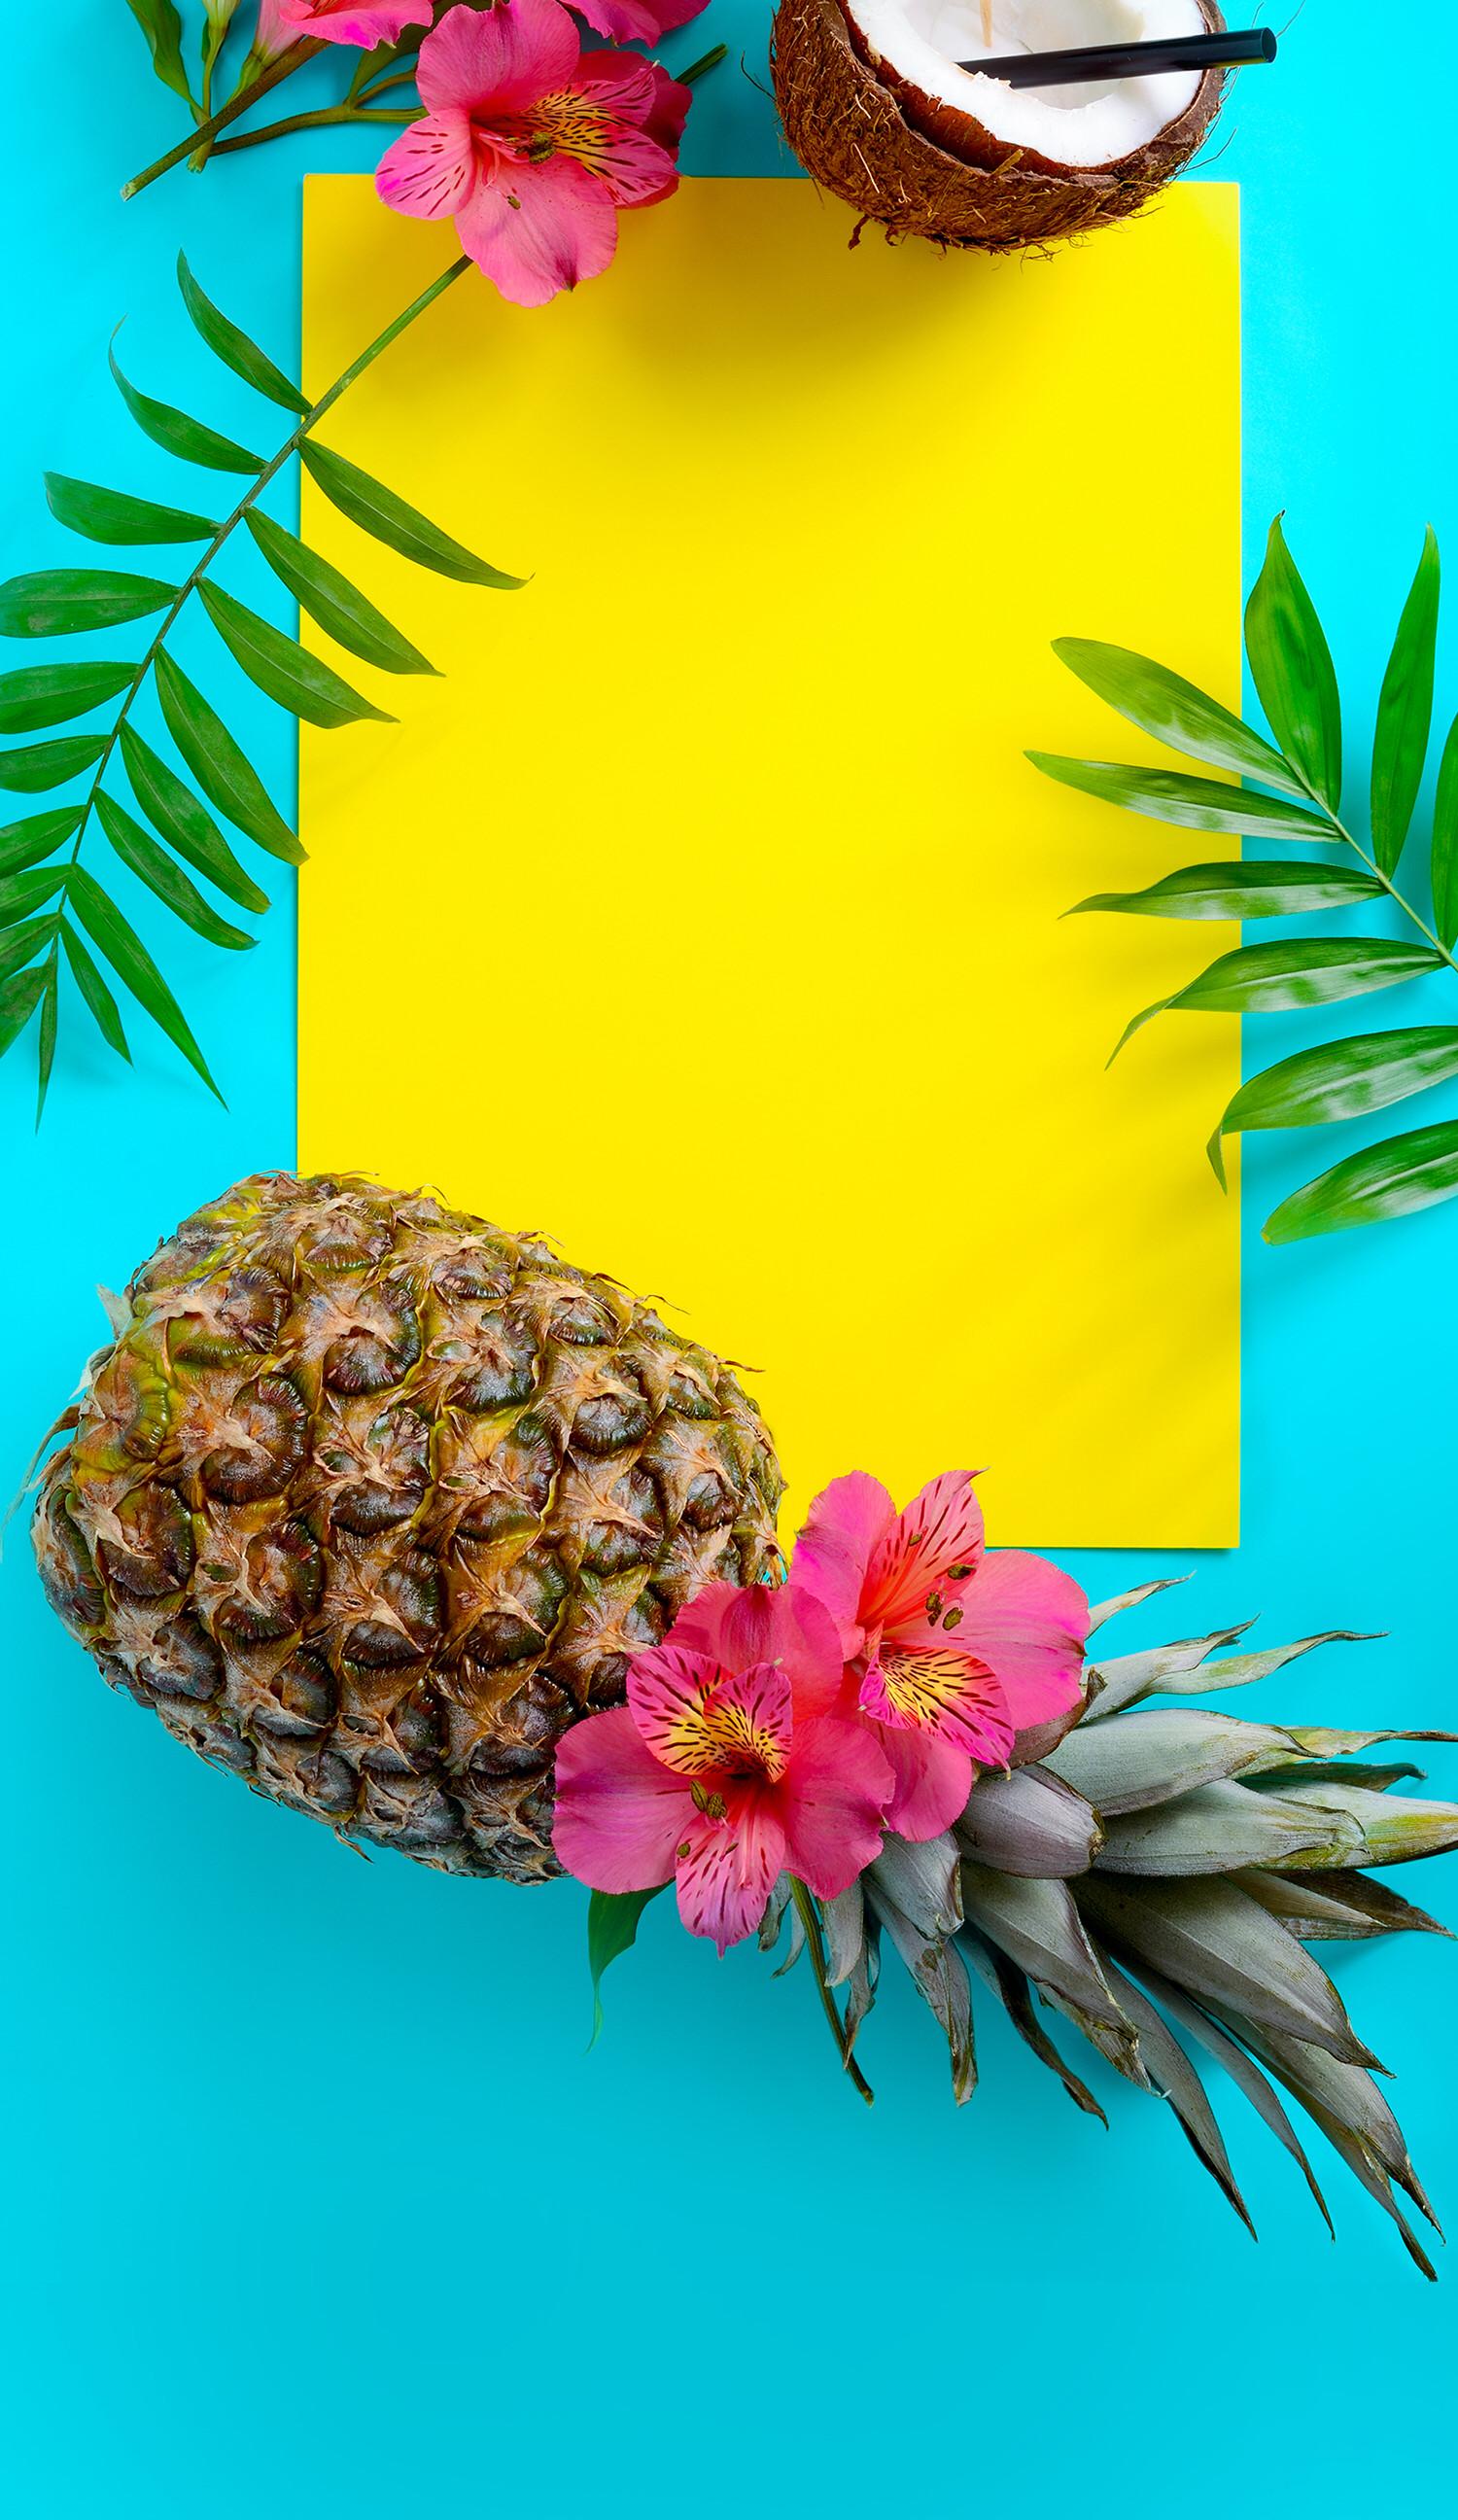 Summer Wallpaper, Iphone Wallpaper, Tropical, Fruit, Wallpapers, Kawaii,  Beautiful Backgrounds, Signboards